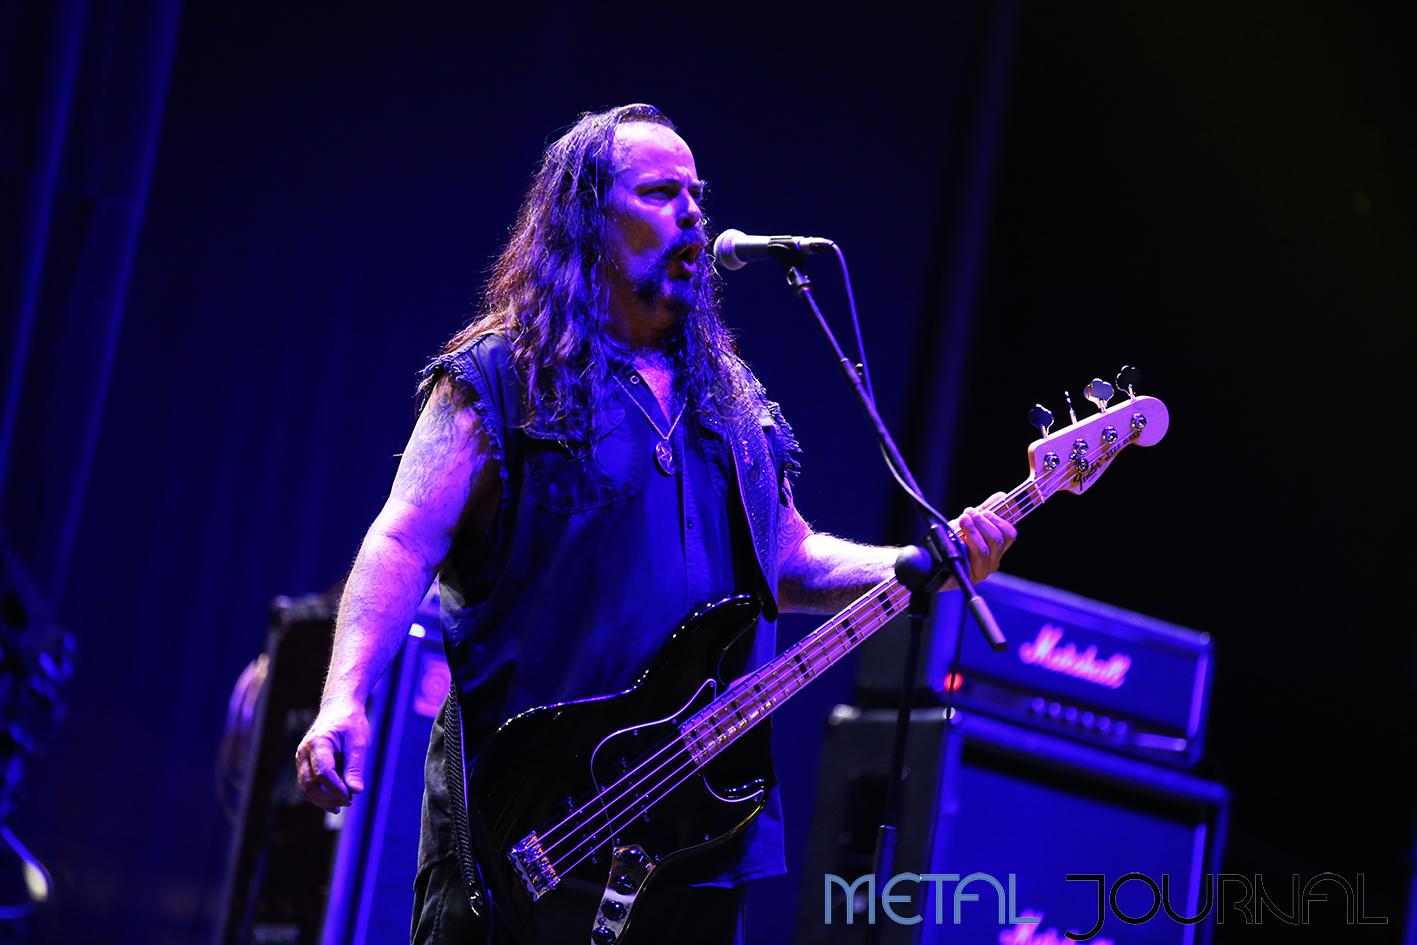 deicide - leyendas del rock 2019 metal journal pic 4